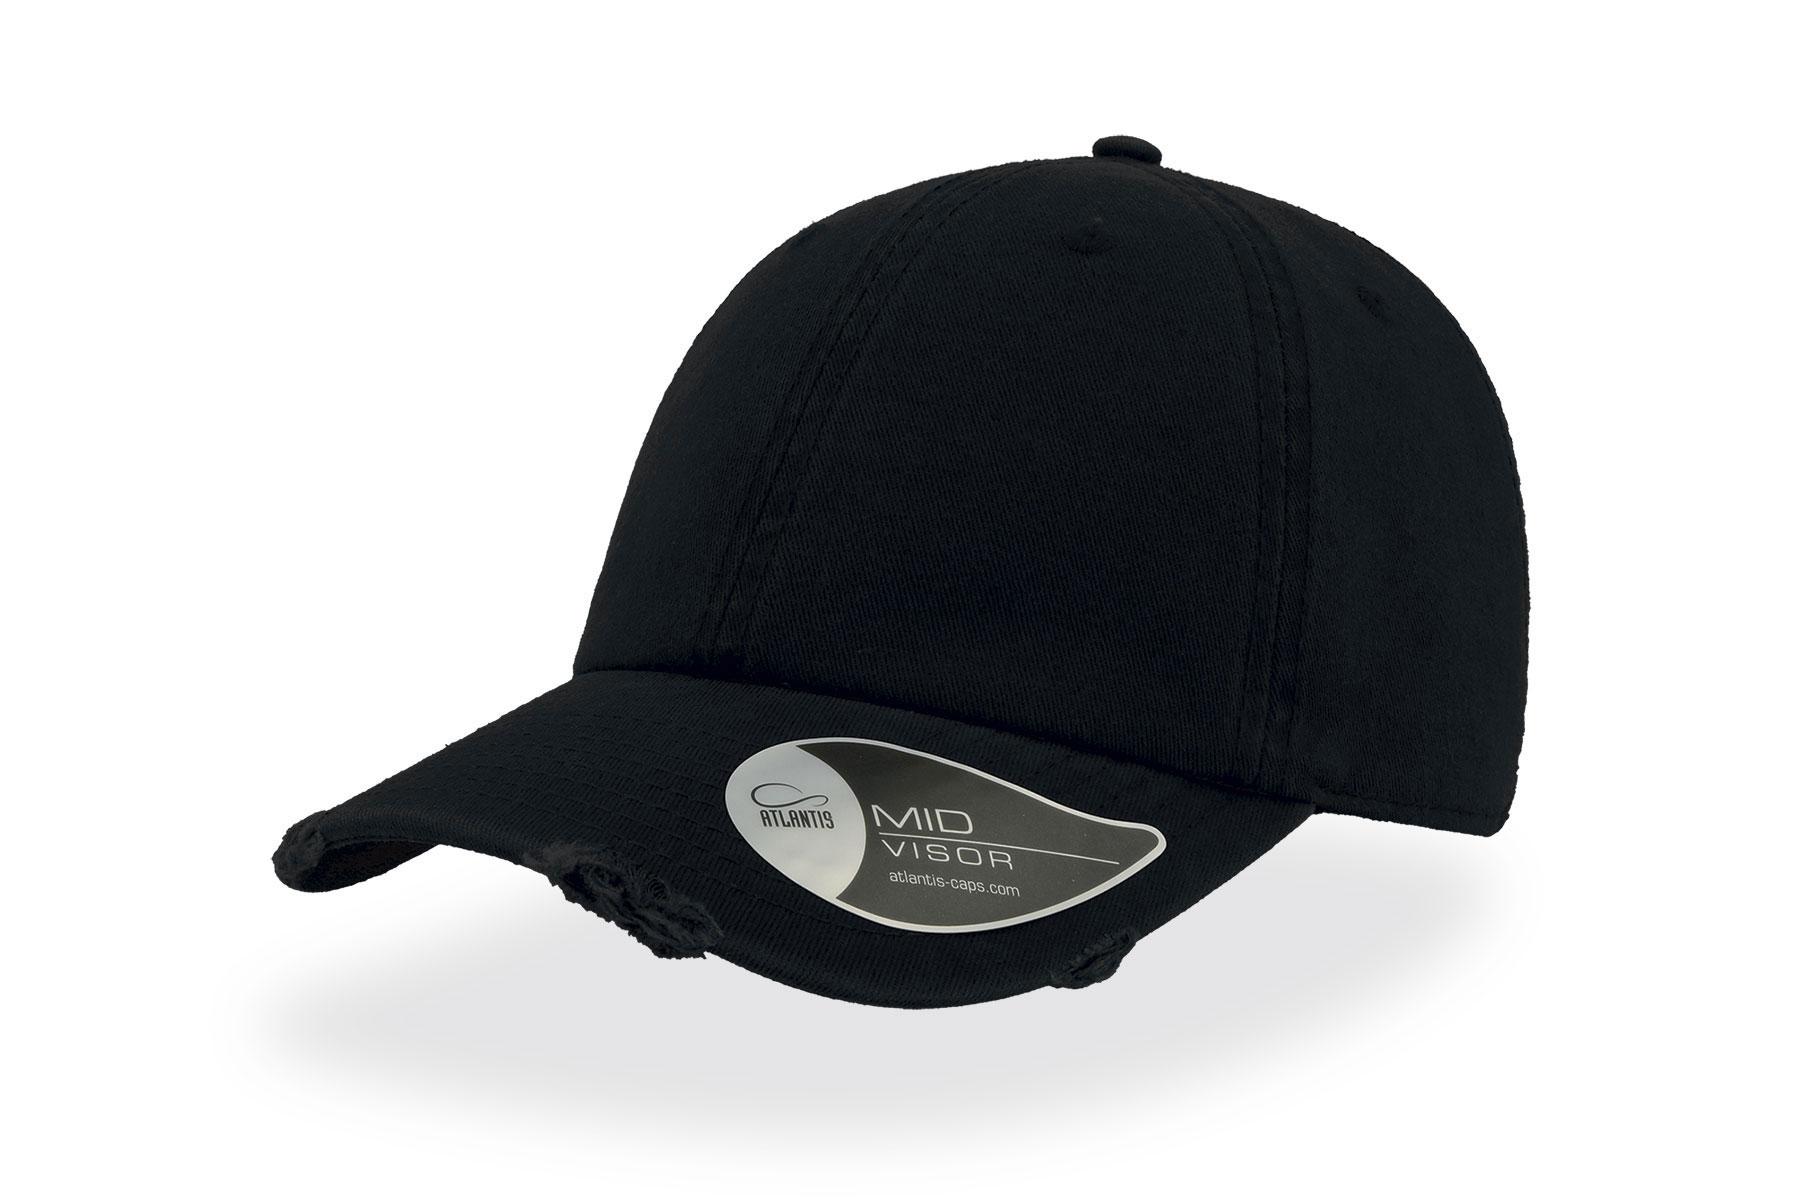 Dad Hat Destroyed Mid Visor-lippis - NEW 2019 ATLANTIS CAPS & HATS - DADE - 2